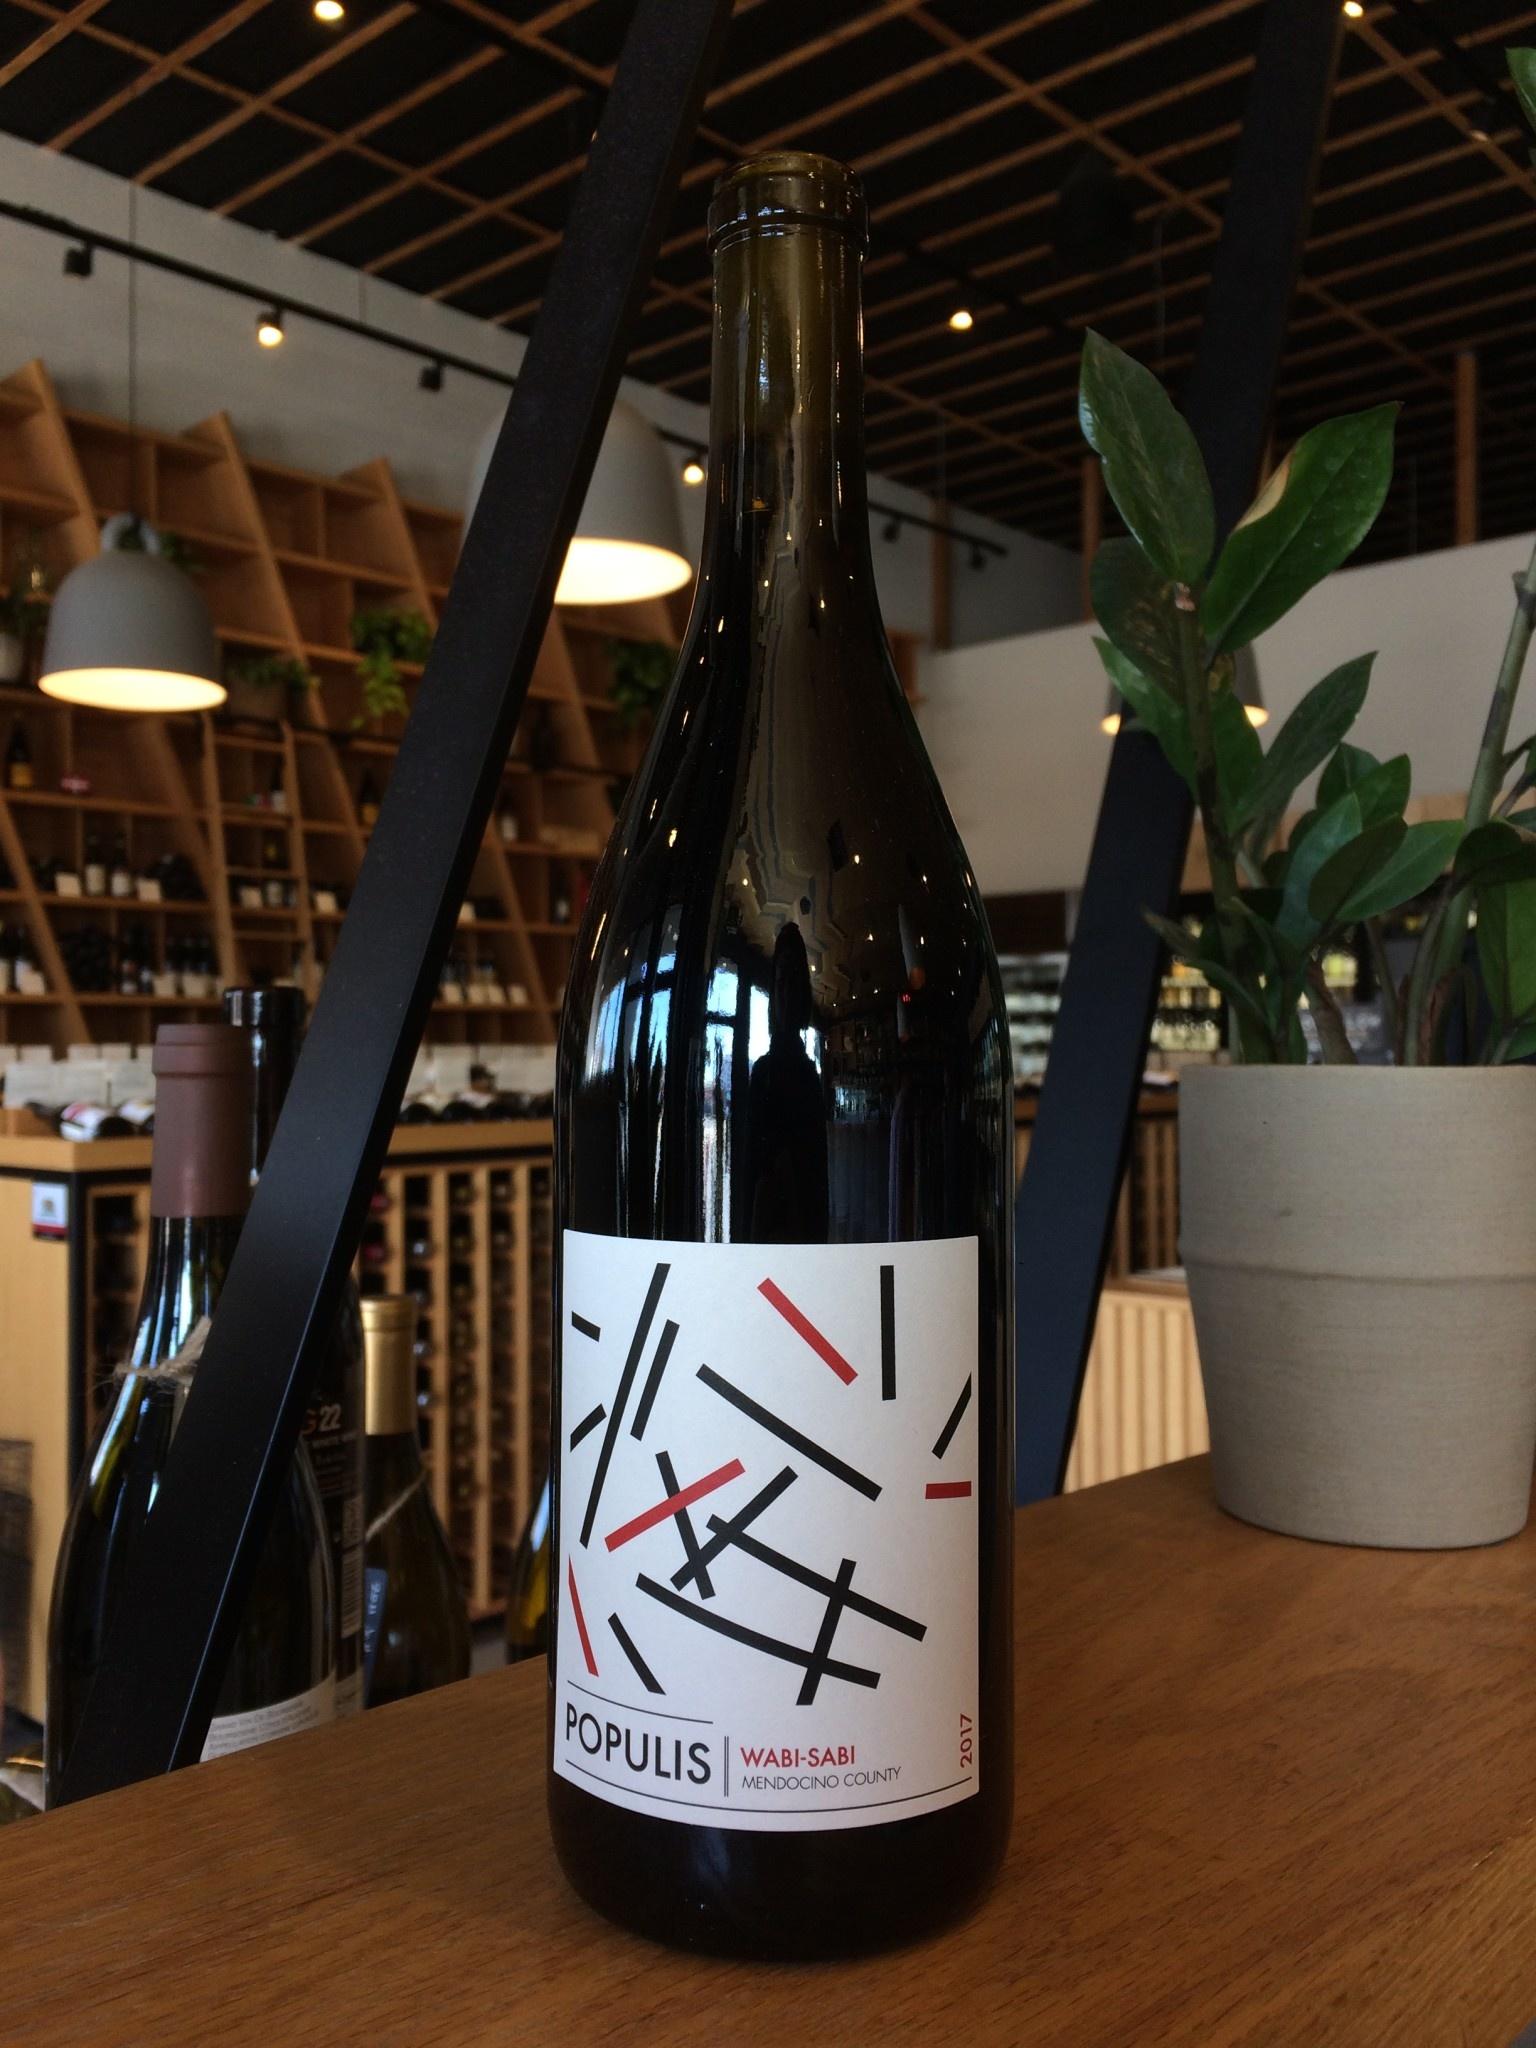 Populis Wine 2017 Populis Wabi Sabi Red Blend 750mL